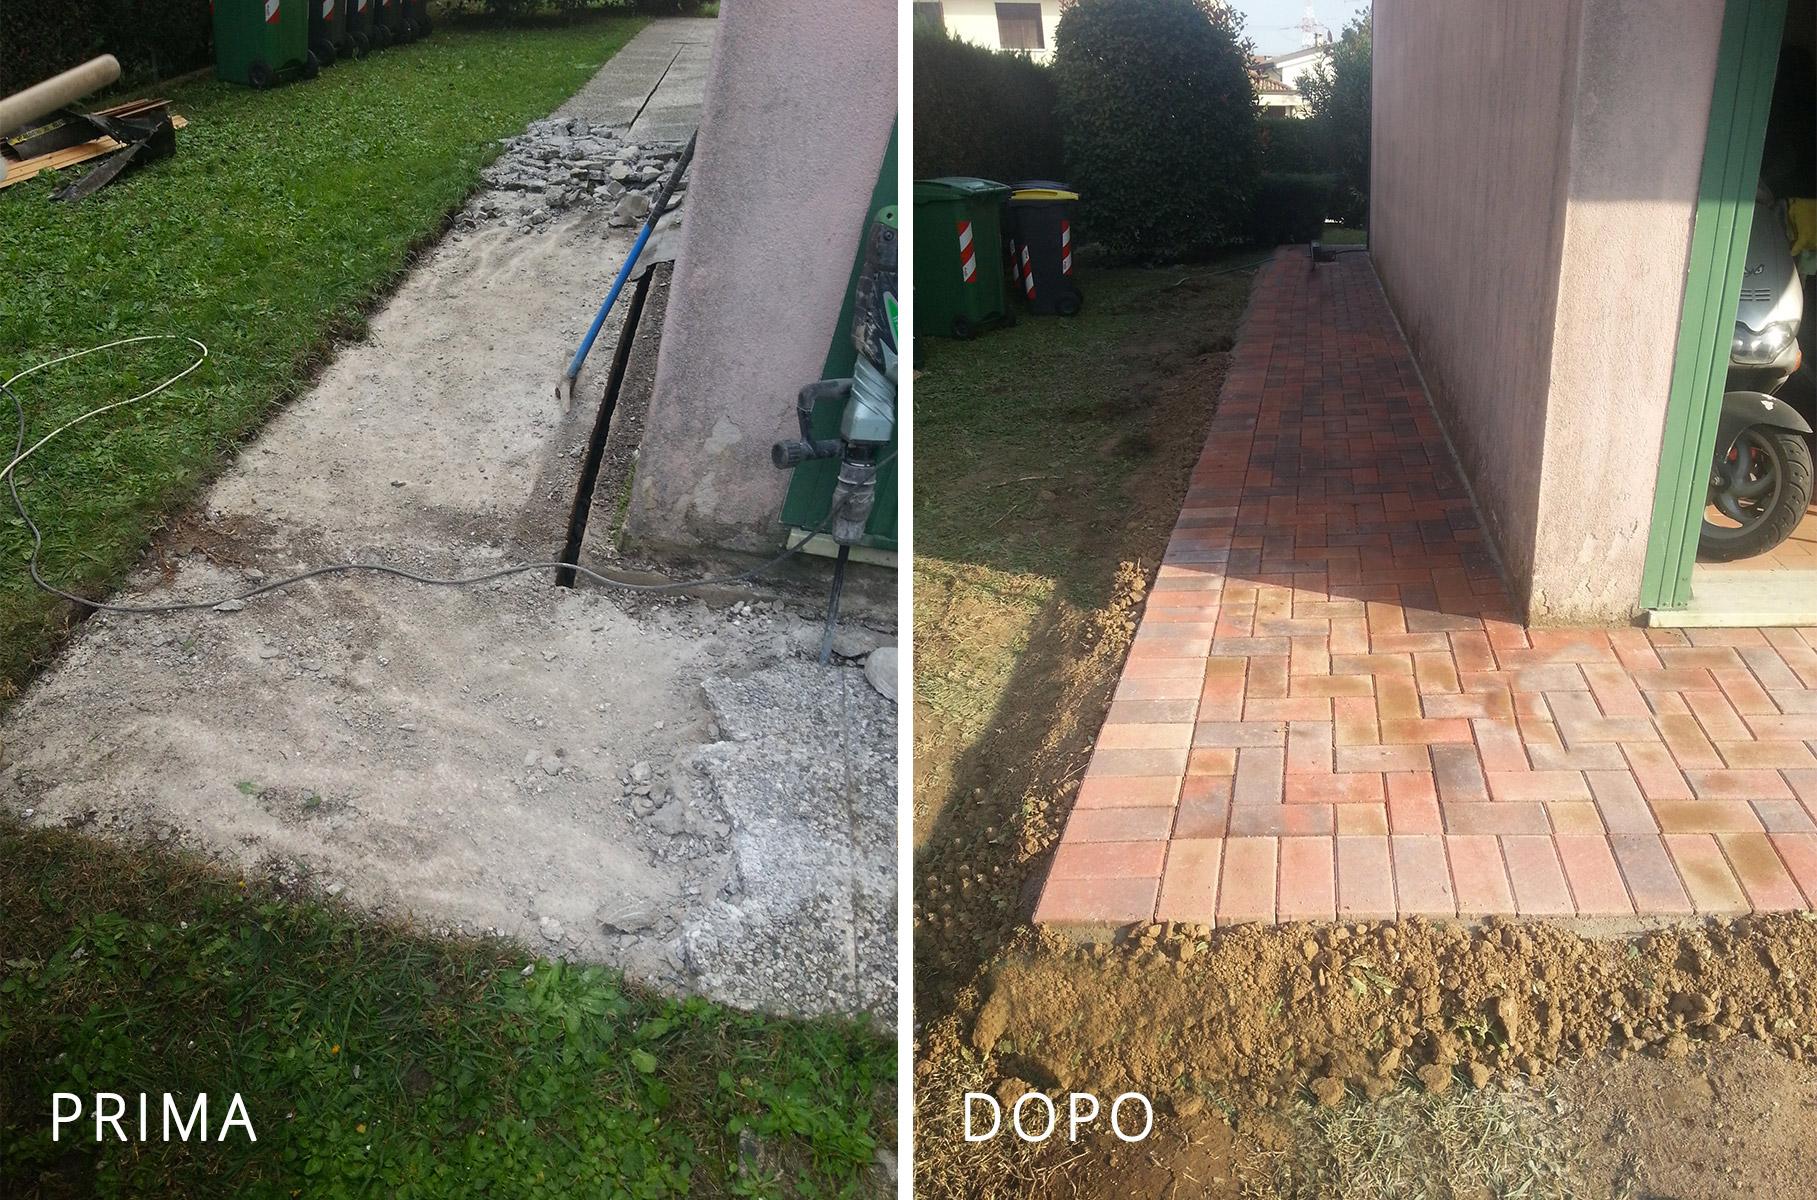 Lavori impresa cosmat engineering s r l - Posa pavimento esterno su cemento ...